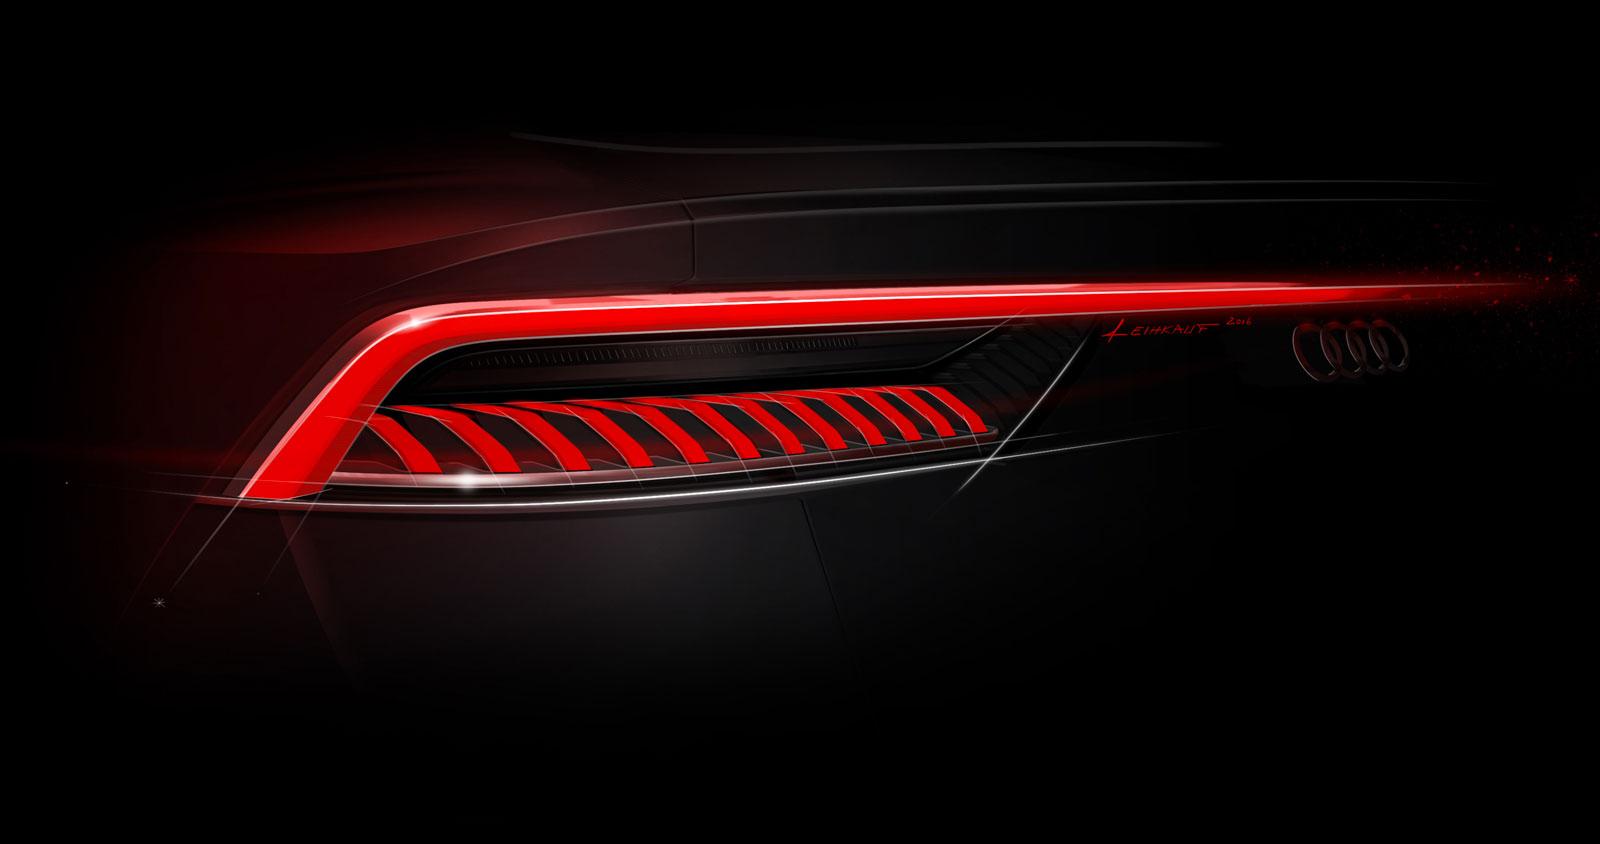 Audi Q8 Tail Light Design Sketch Car Body Design